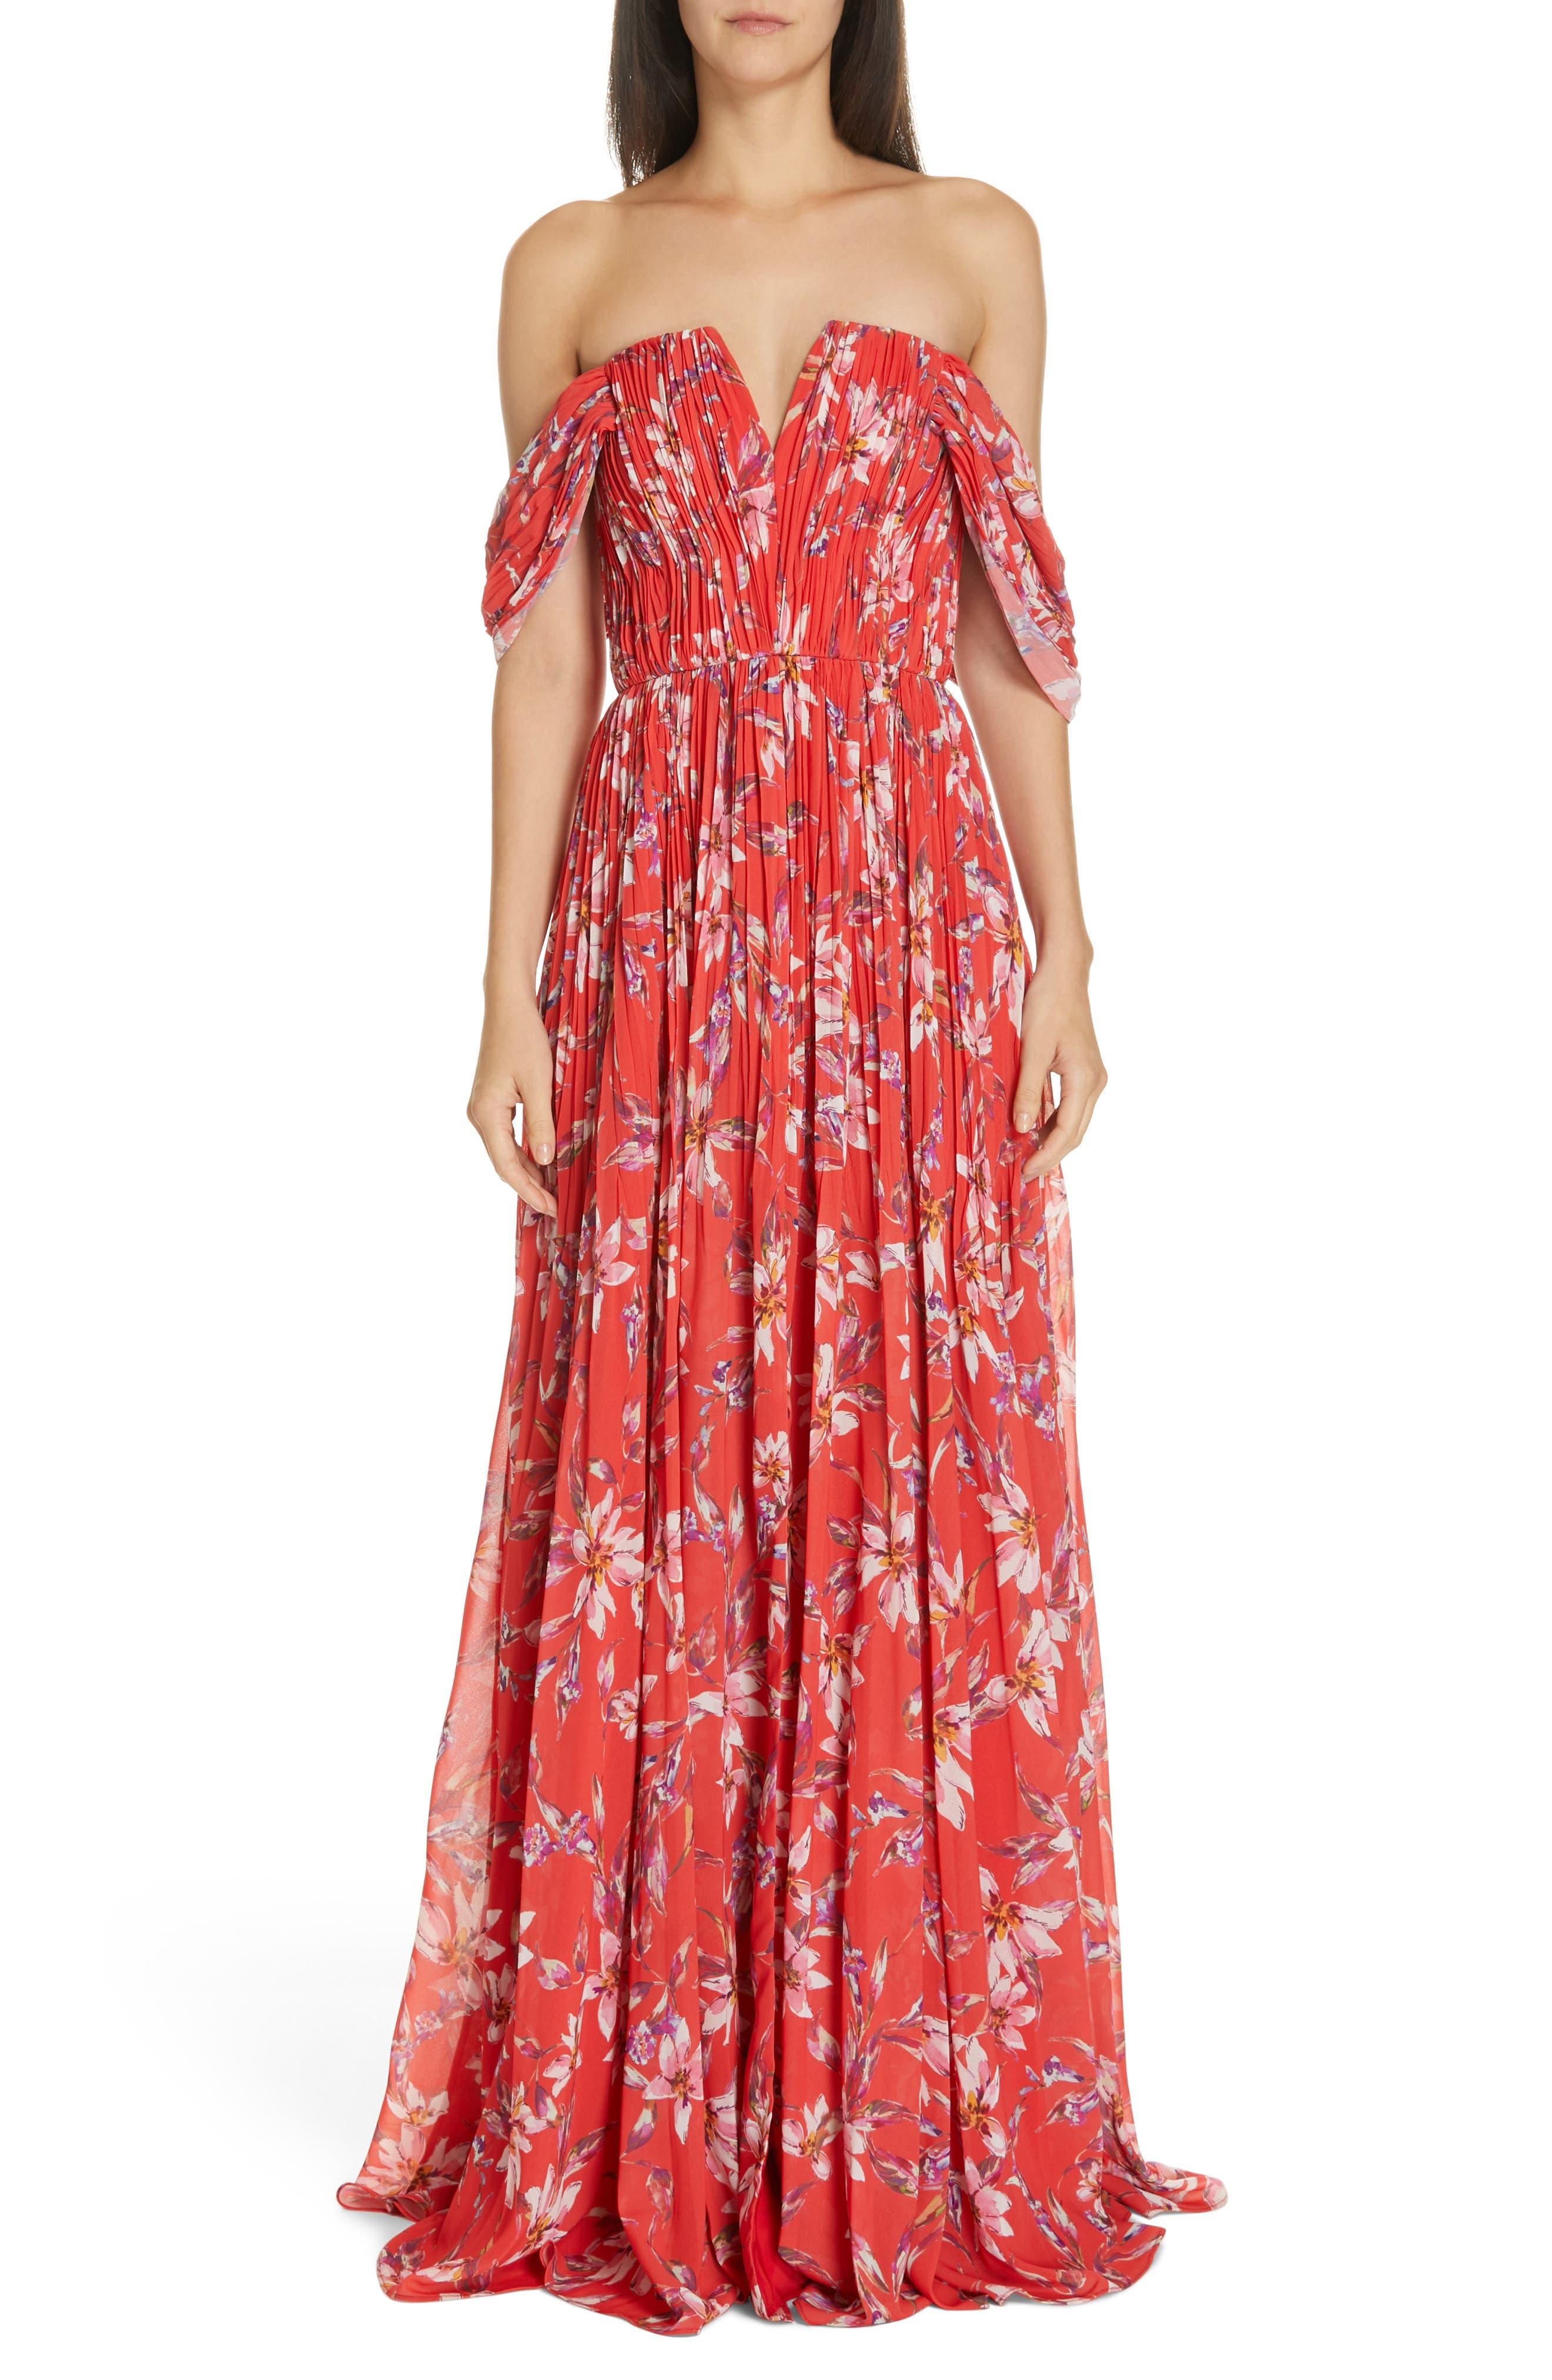 Amur Kyla Off The Shoulder Chiffon Maxi Dress, Red